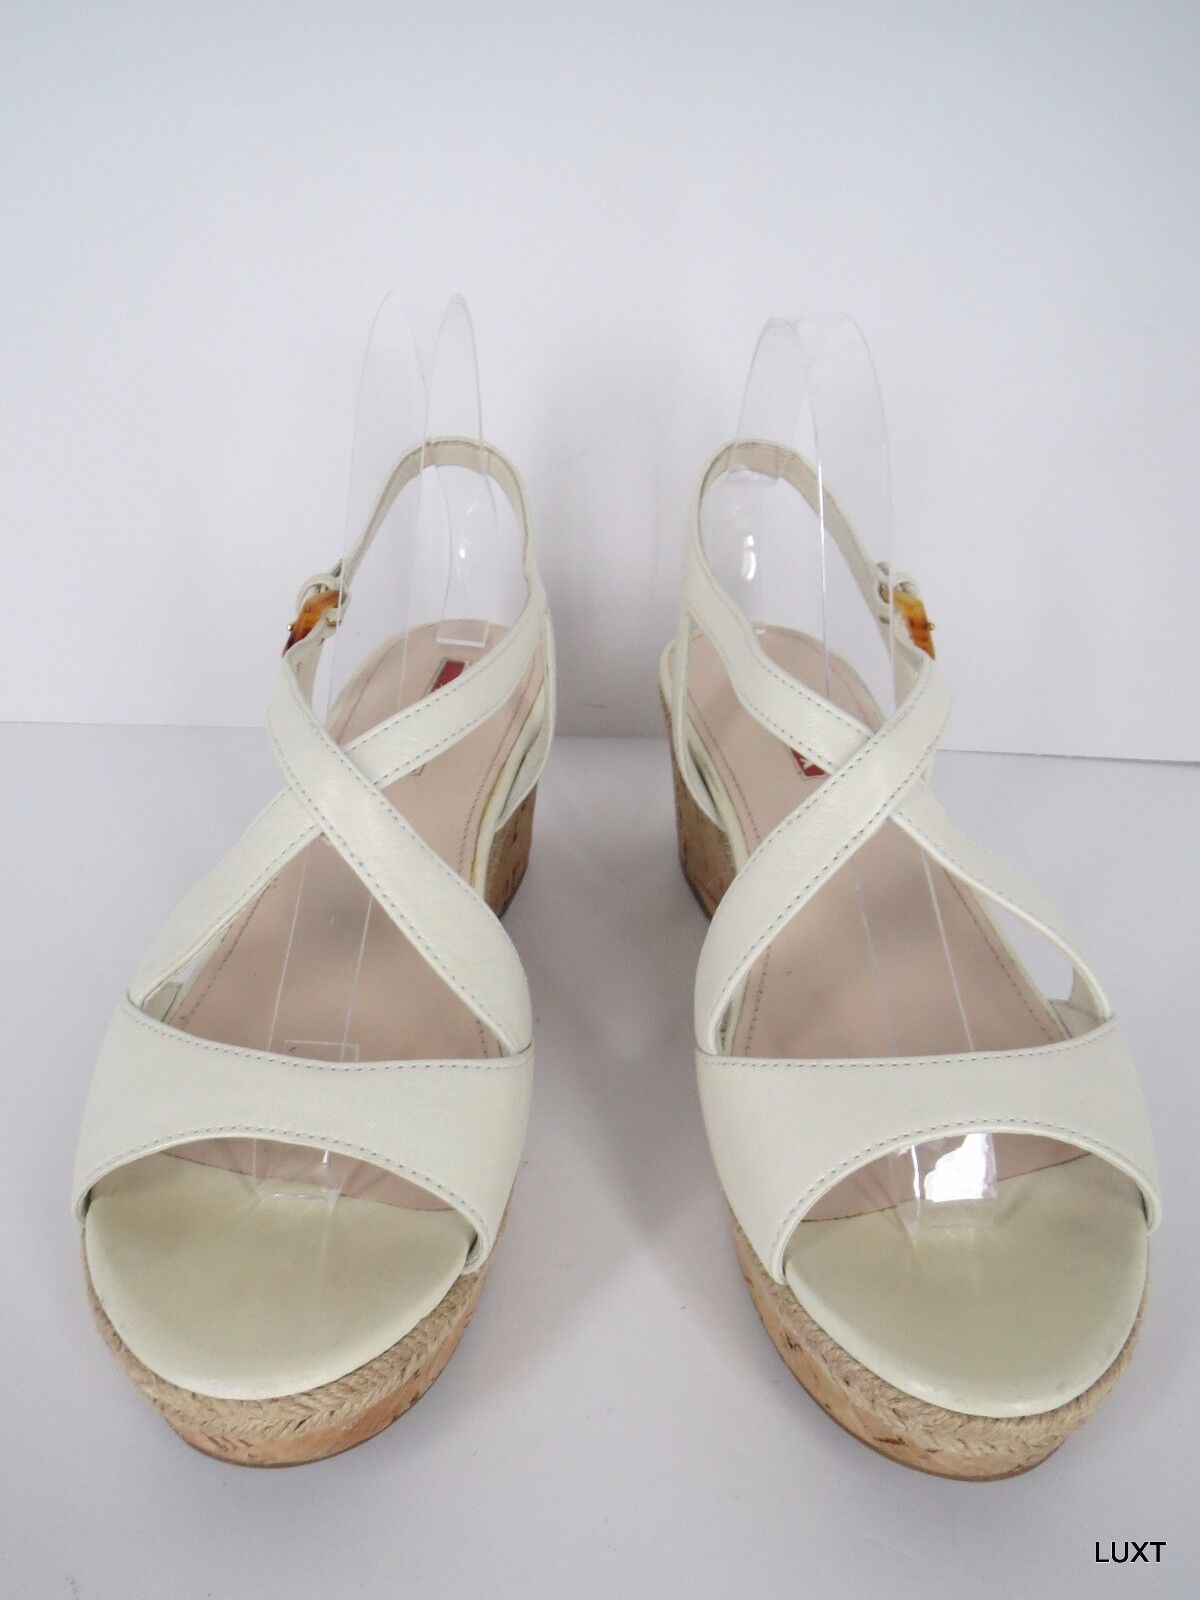 Prada Sandals Wedges Heels Sz 9 39 Leather Ivory Cork Platform Strappy Mary Jane